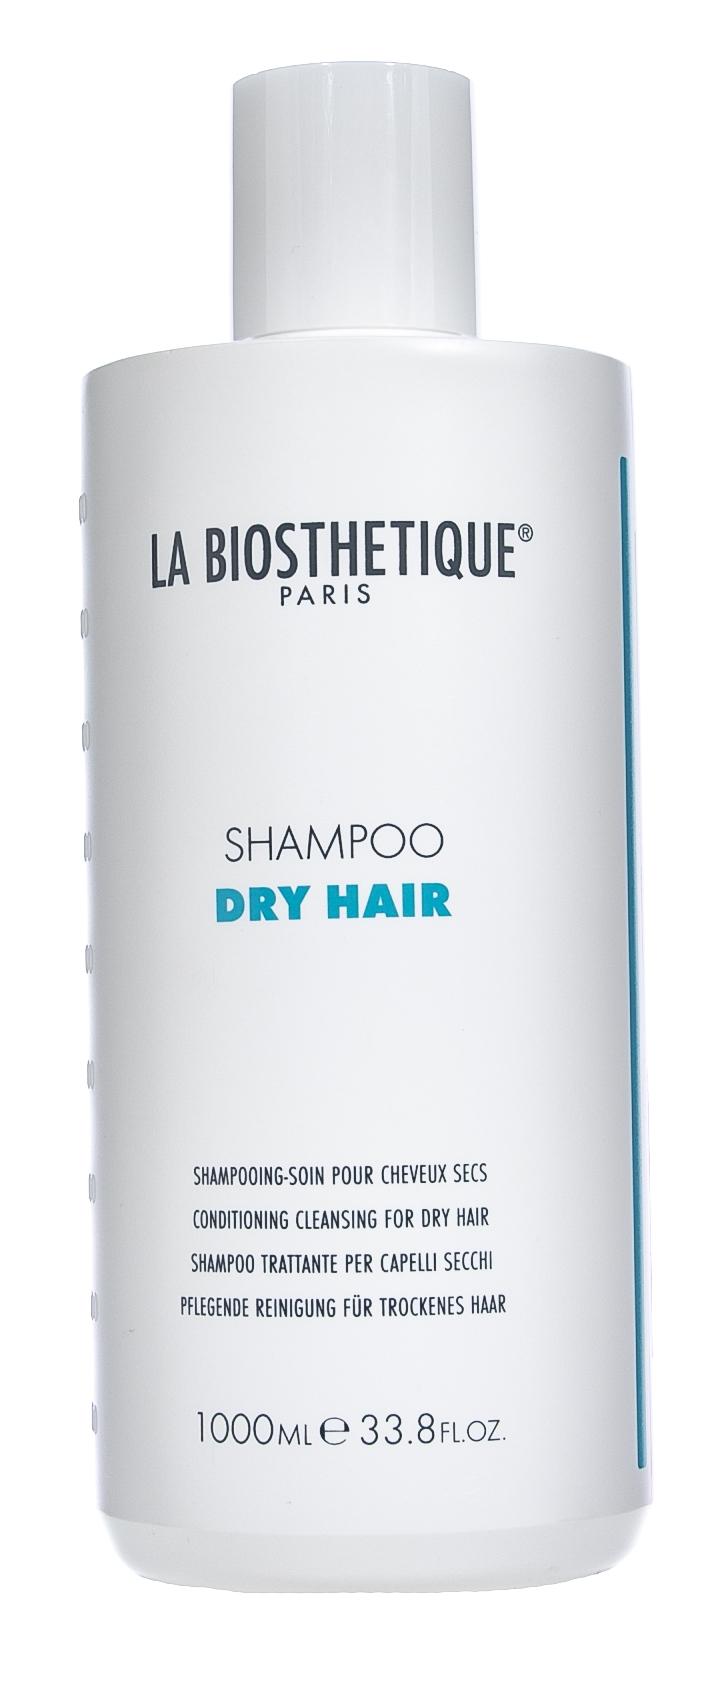 La Biosthetique Шампунь Dry Hair Shampoo Мягко Очищающий для Сухих Волос, 1000 мл curex classic набор для волос эстель шампунь бальзам маска 1000 1000 500 мл